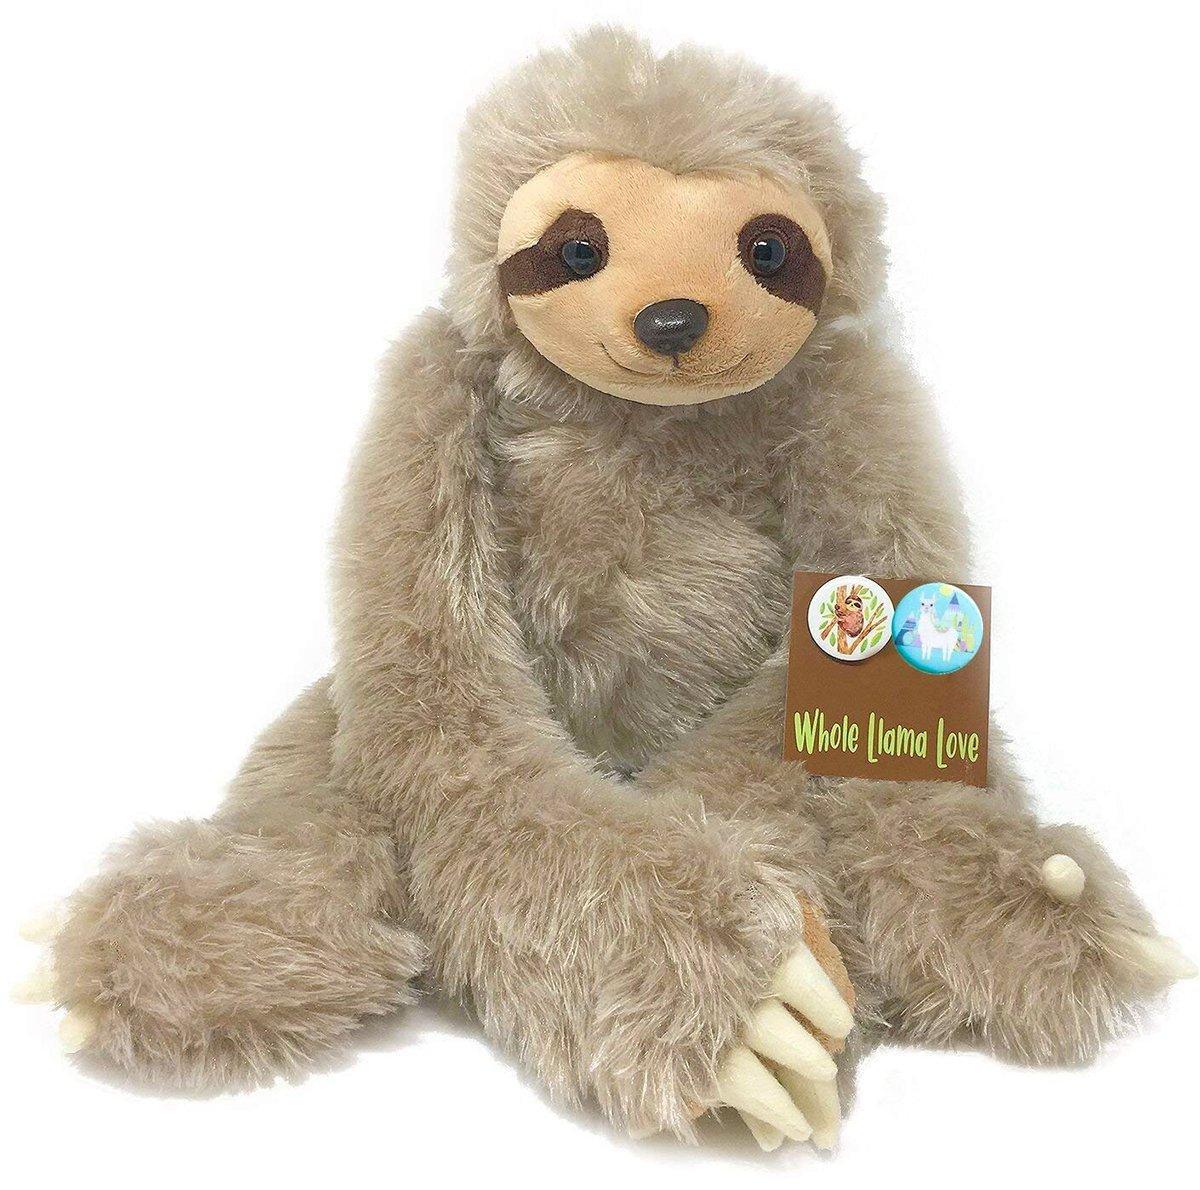 Sloth Stuffed Animal - 20'' Plush - Long Cuddly Arms That Attach & 2 Bonus Pins - Super Soft by Whole Llama Love